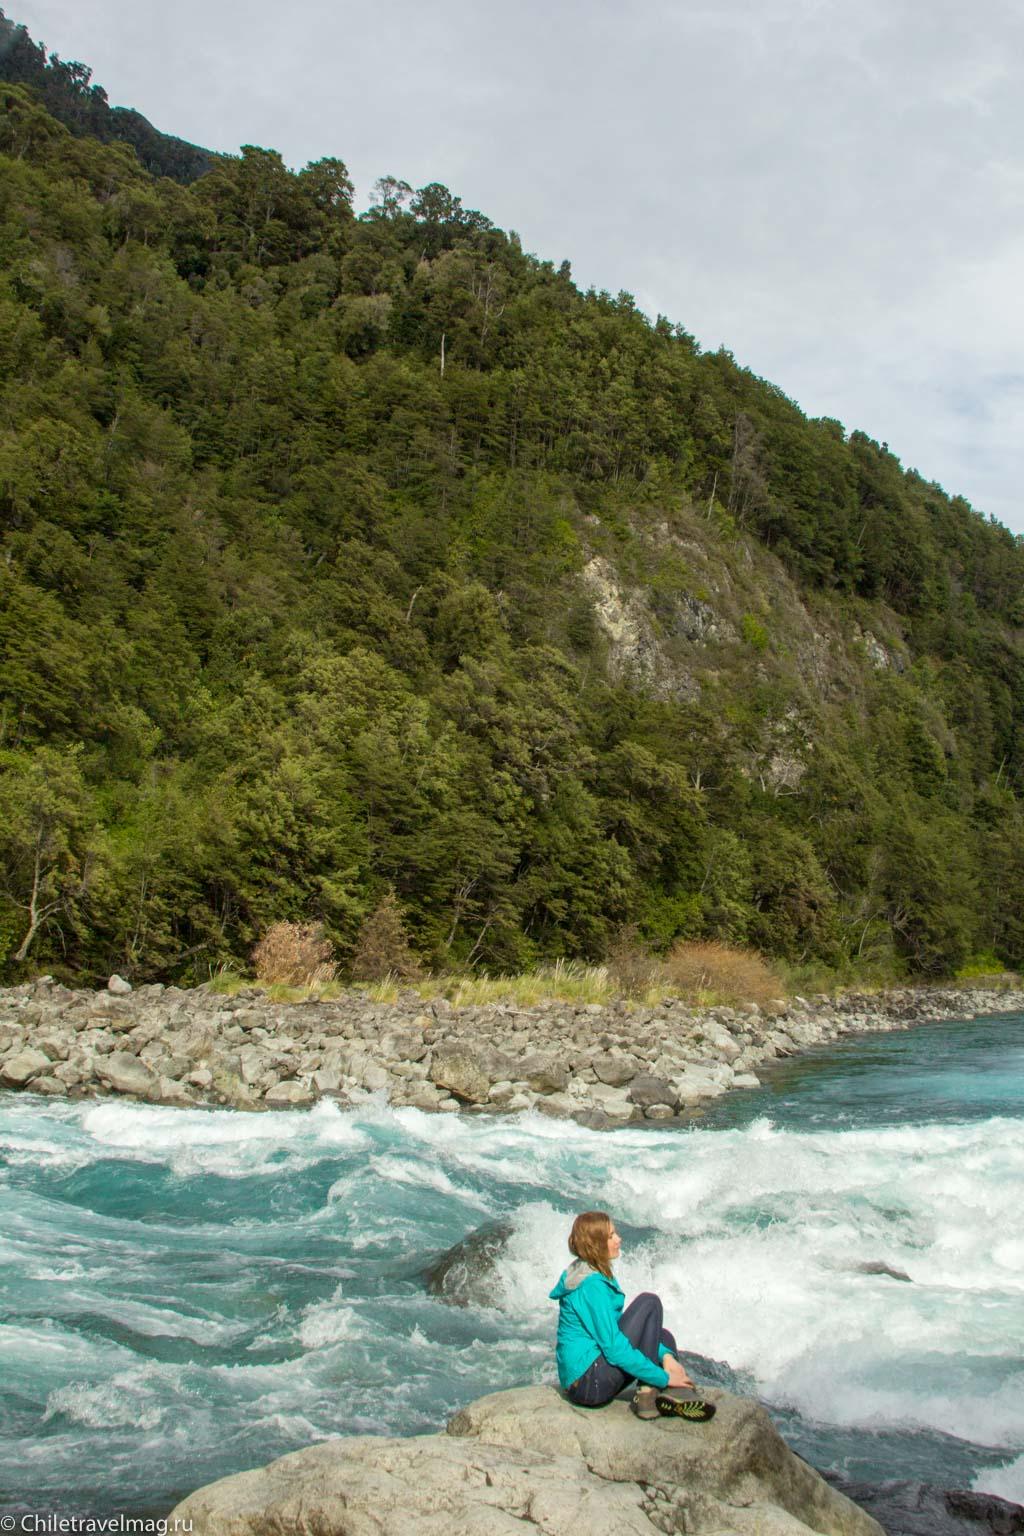 Водопады Петроуэ-Пуэрто-Варас-perez-rozales-park-saltos-petrohue-puerto-varas-chiletravelmag-blog-28